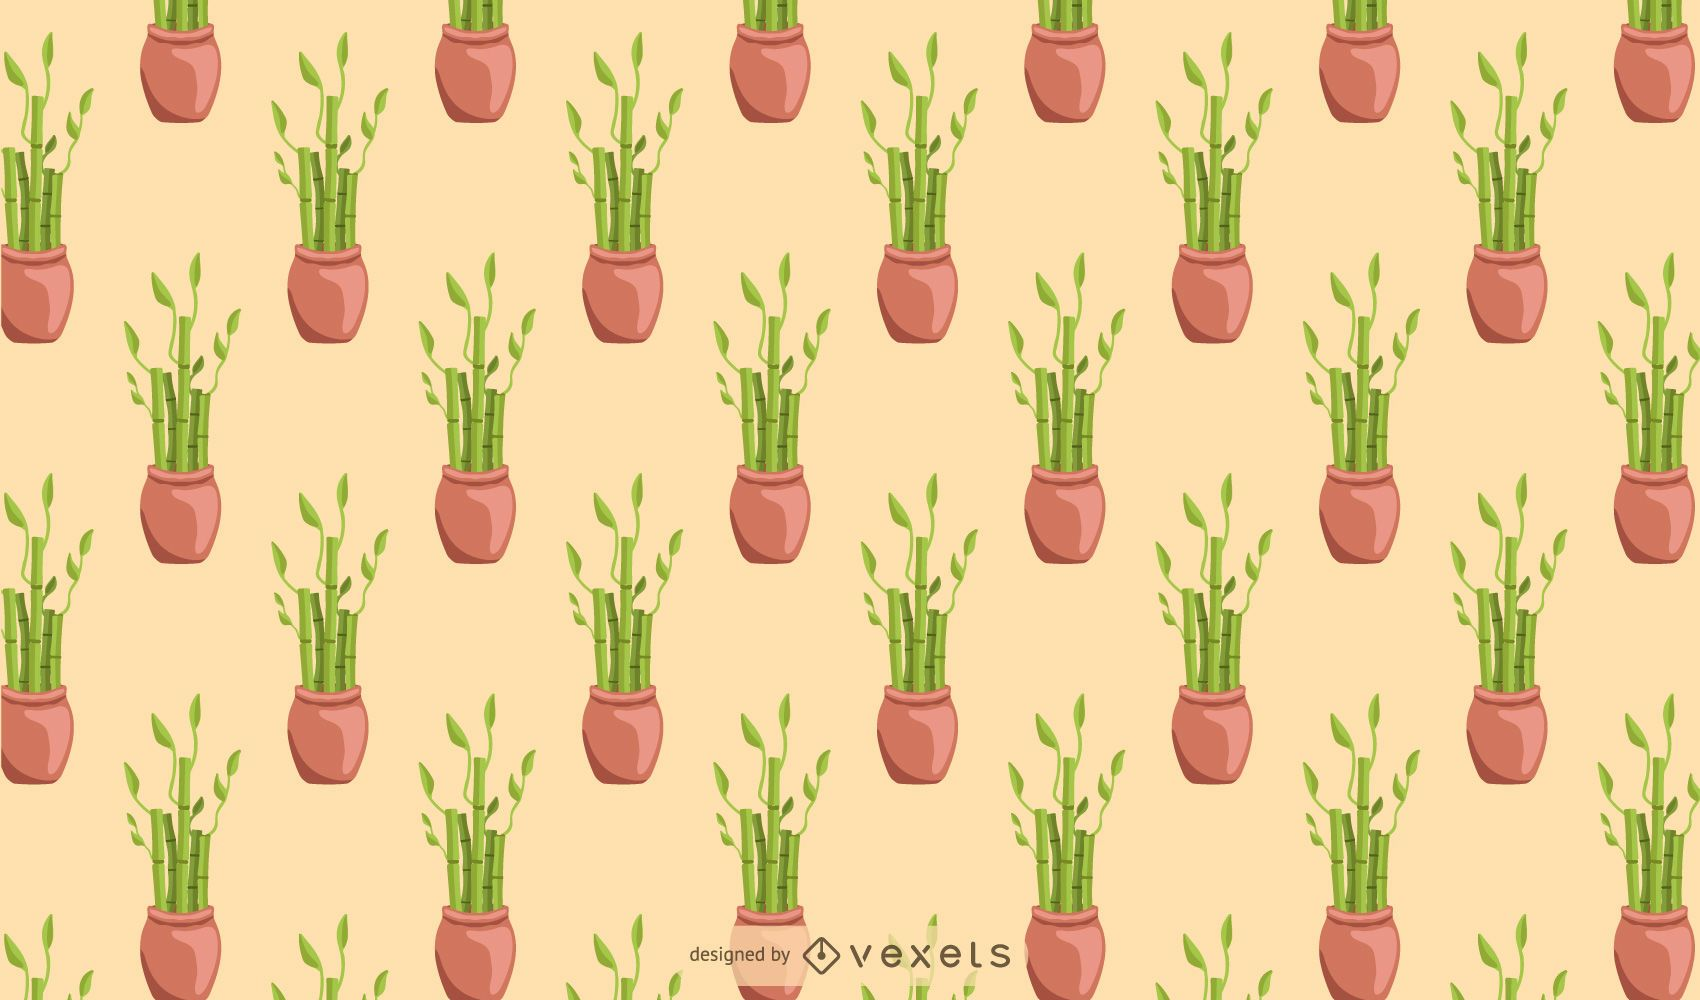 Bamboo lucky houseplant pattern design